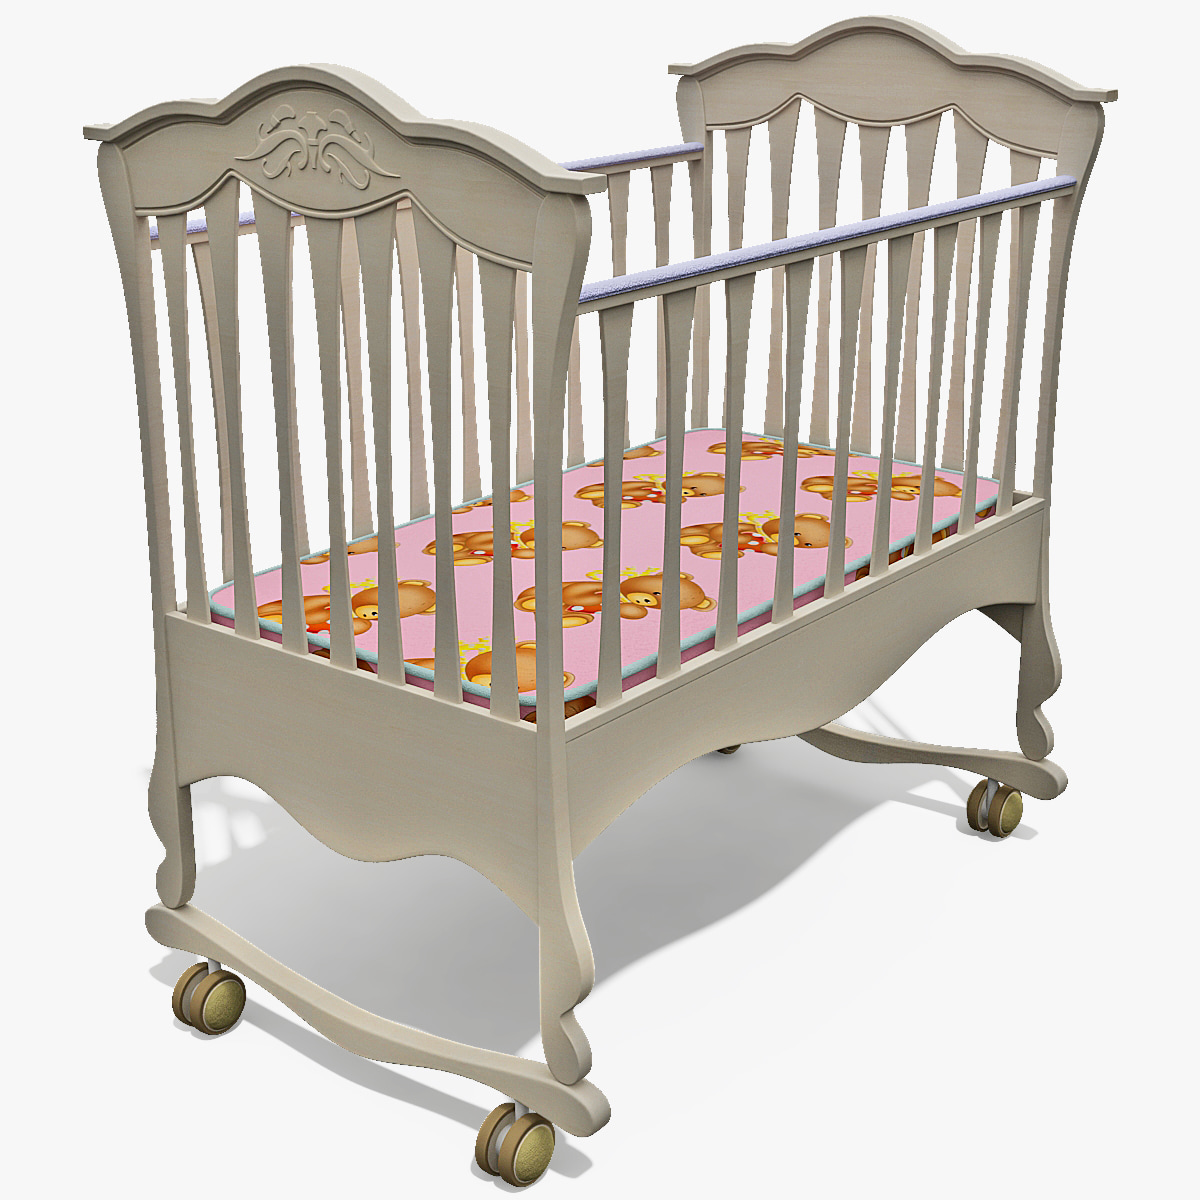 Baby_Bed_000.jpg